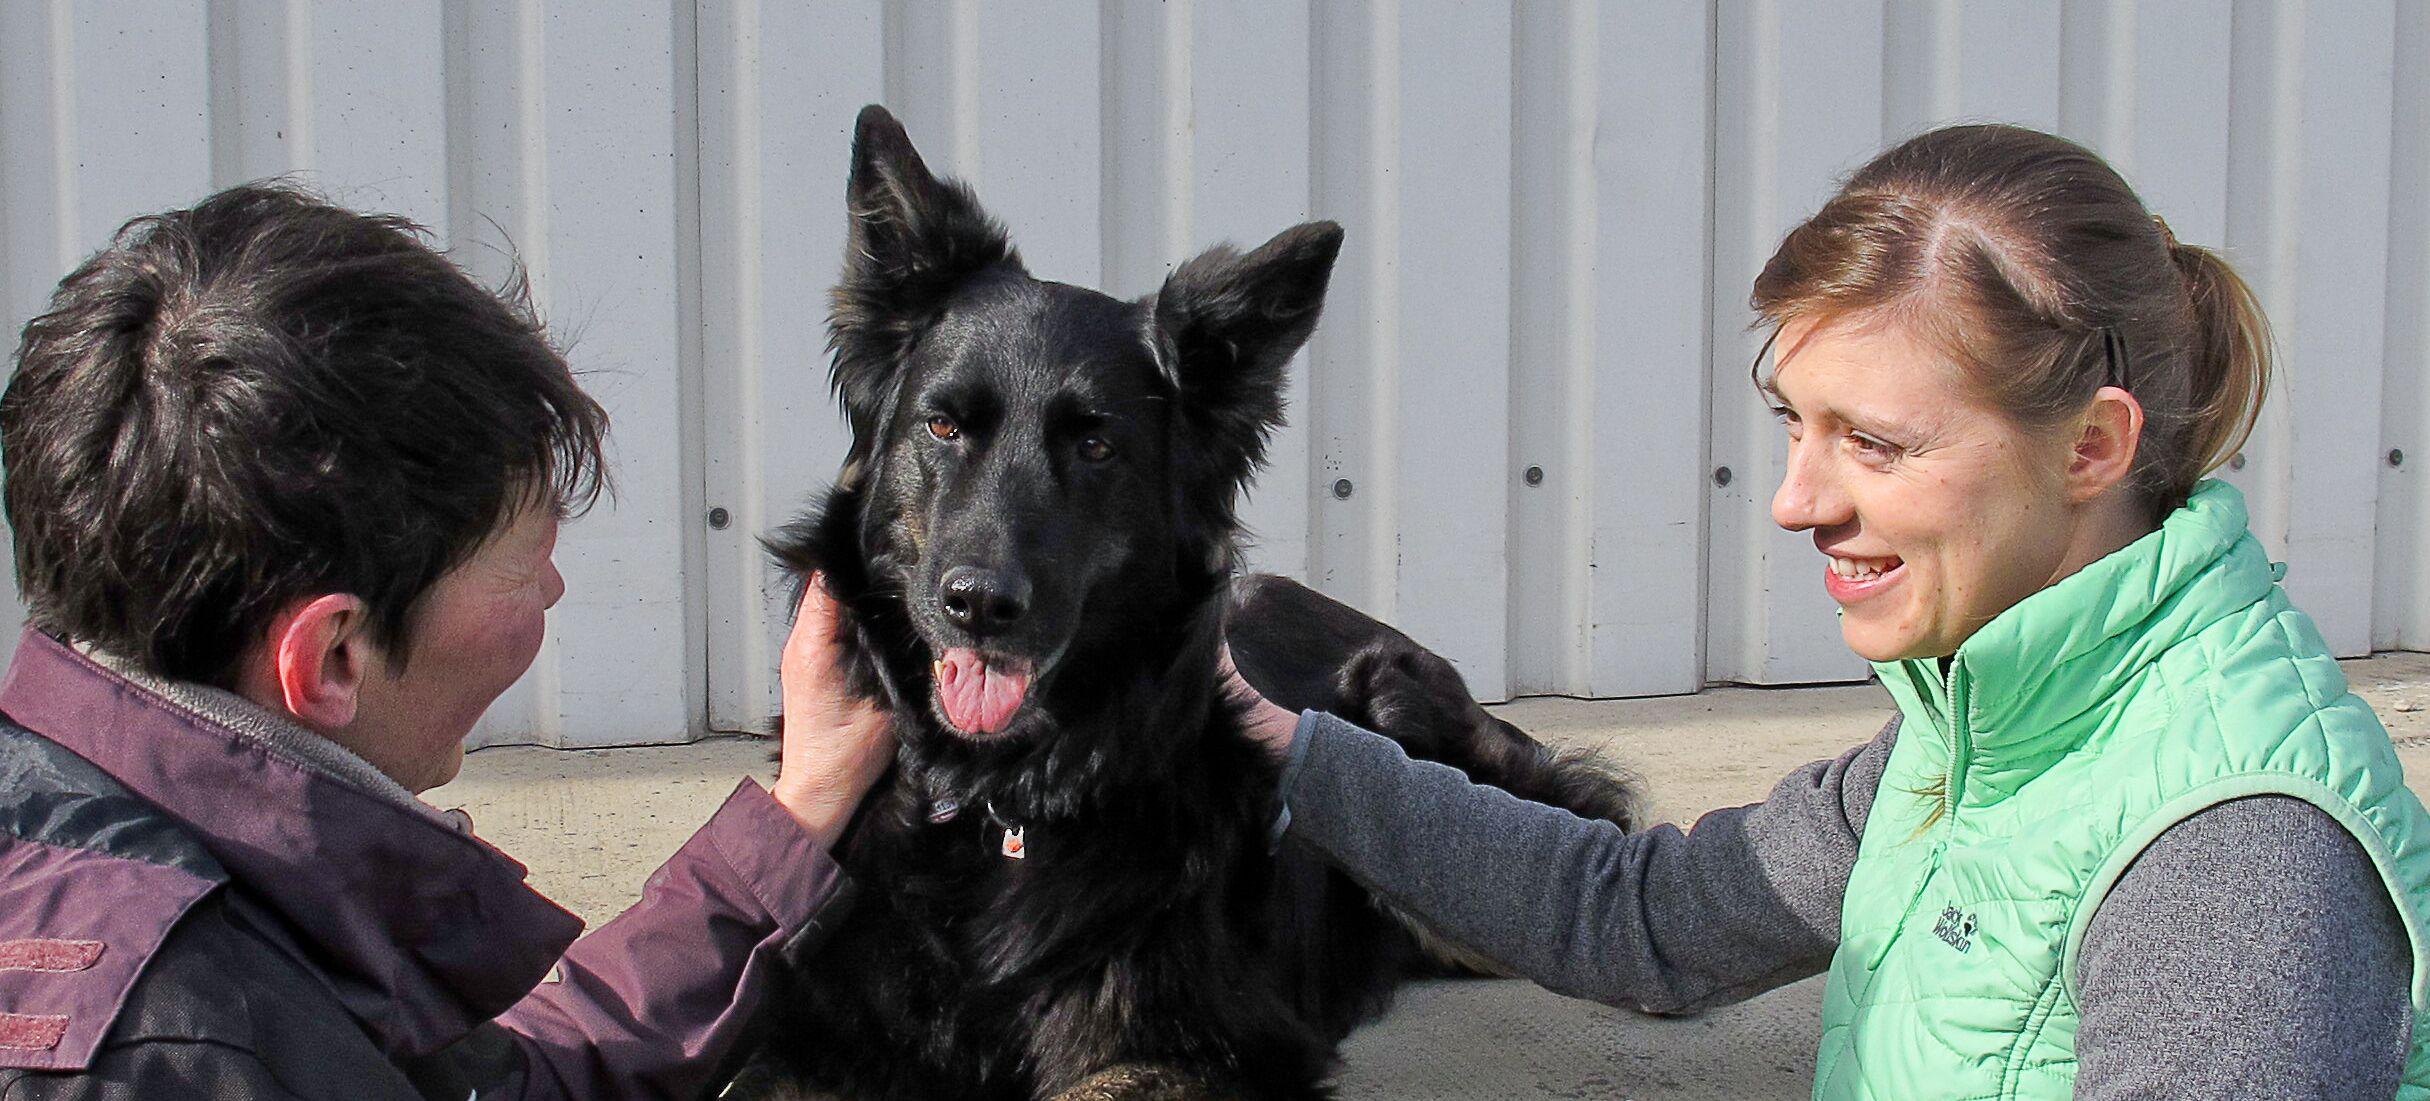 Hundephysiotherapie Torgau Delitzsch Oschatz